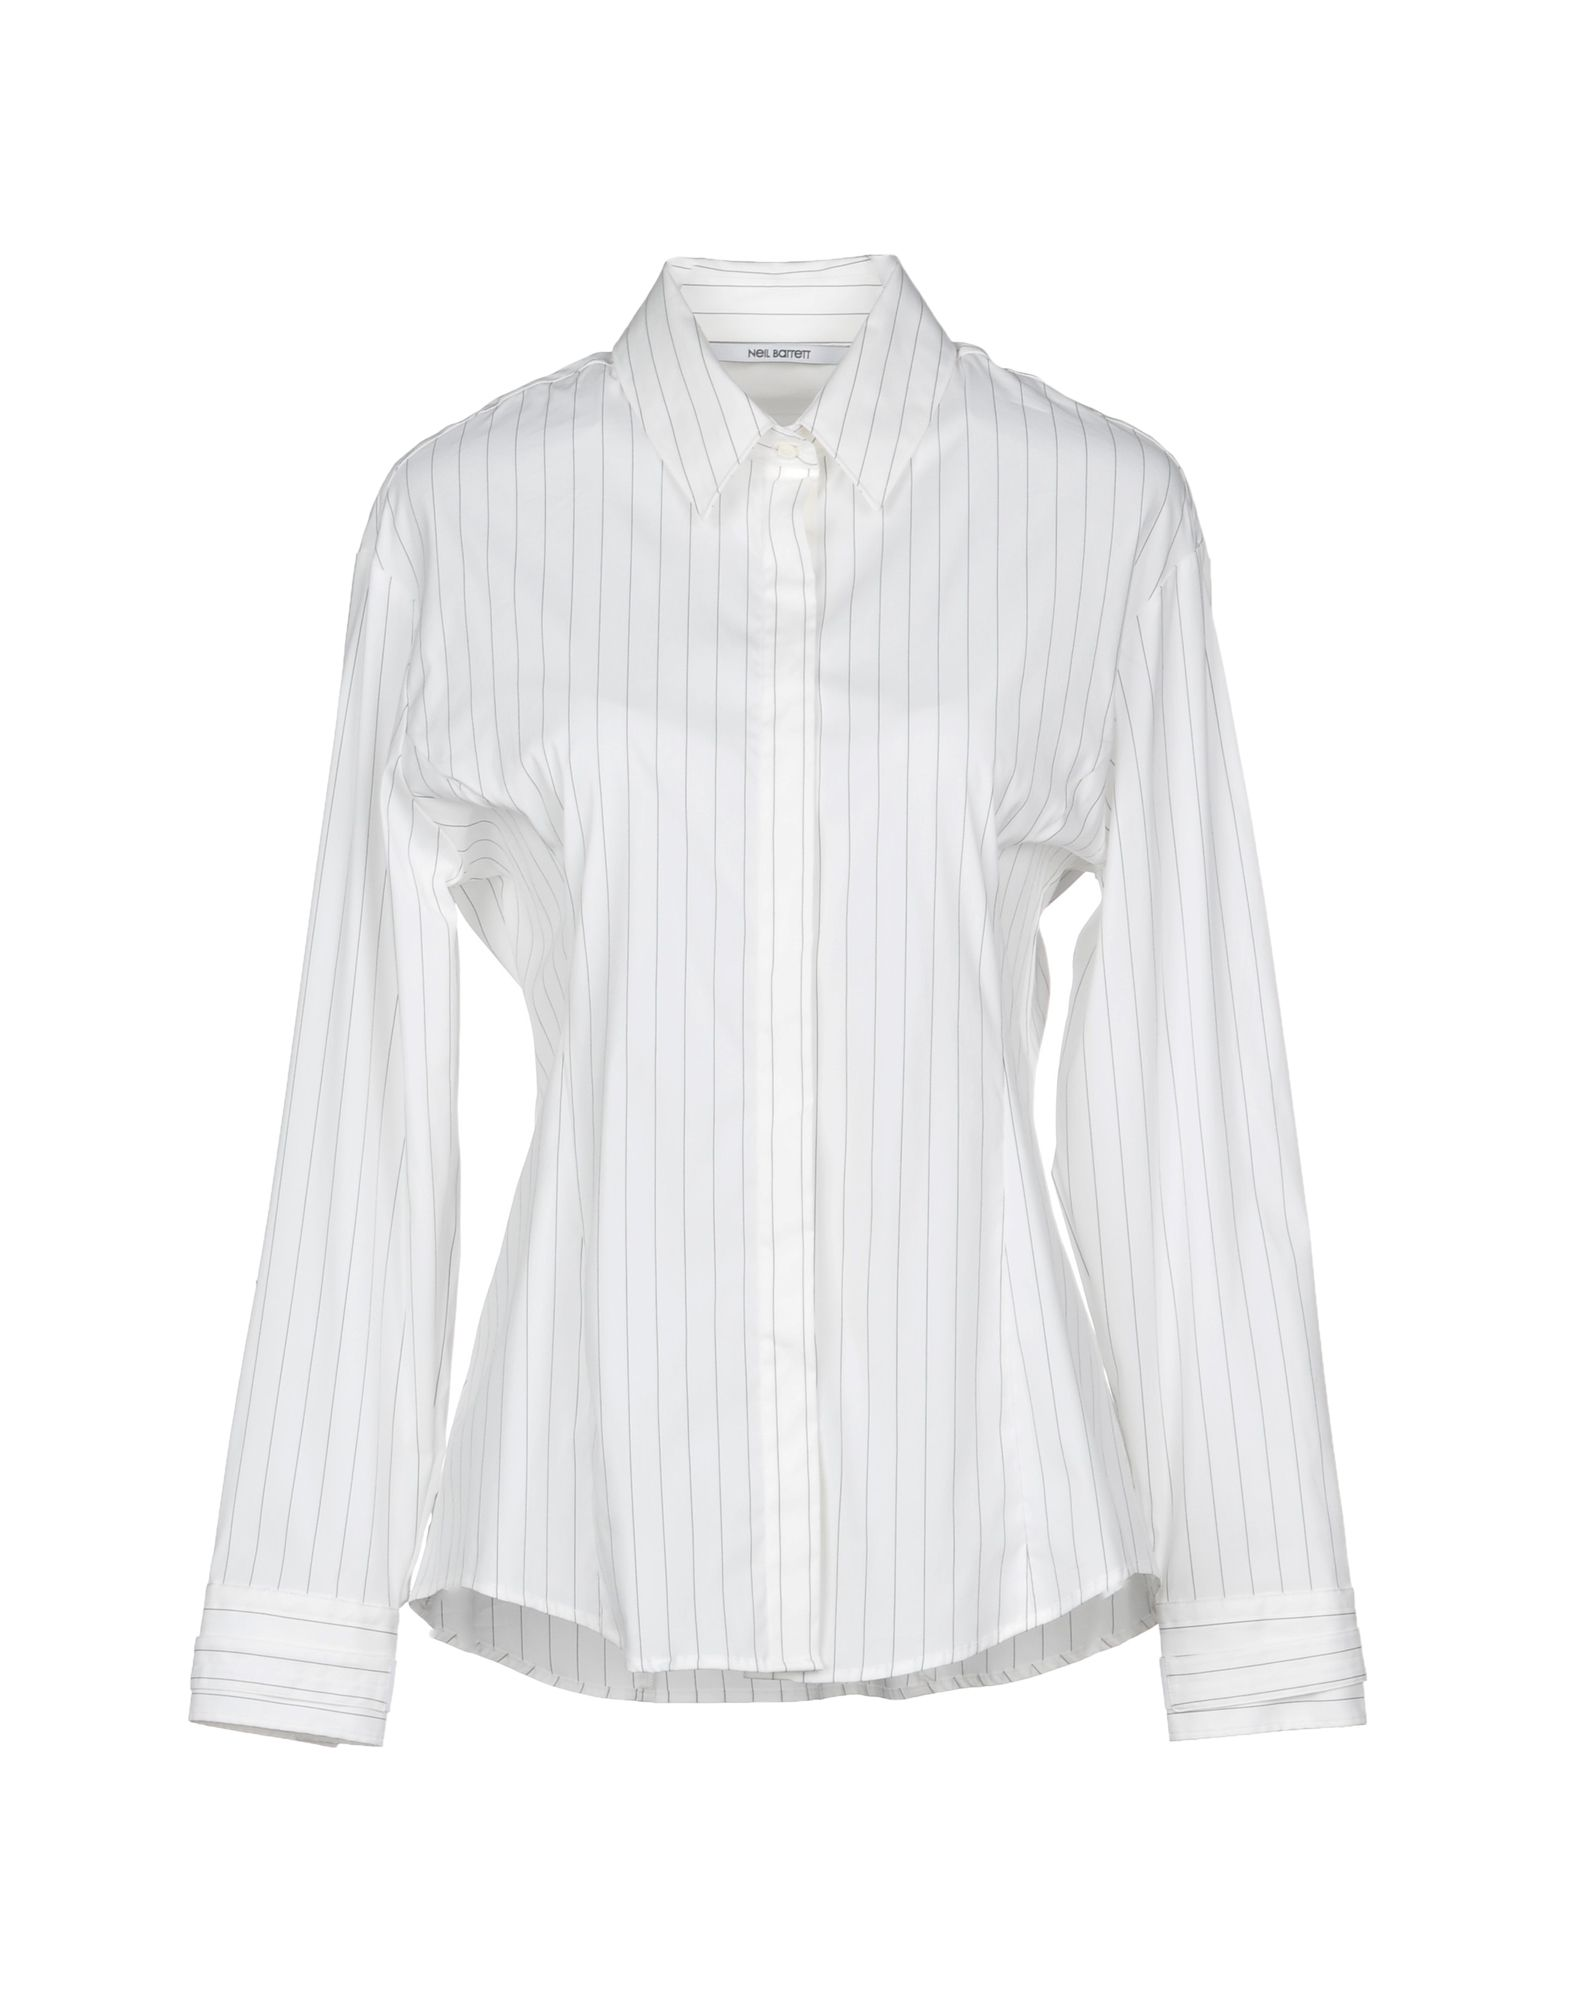 NEIL BARRETT Pубашка neil barrett хлопковая рубашка в полоску page 2